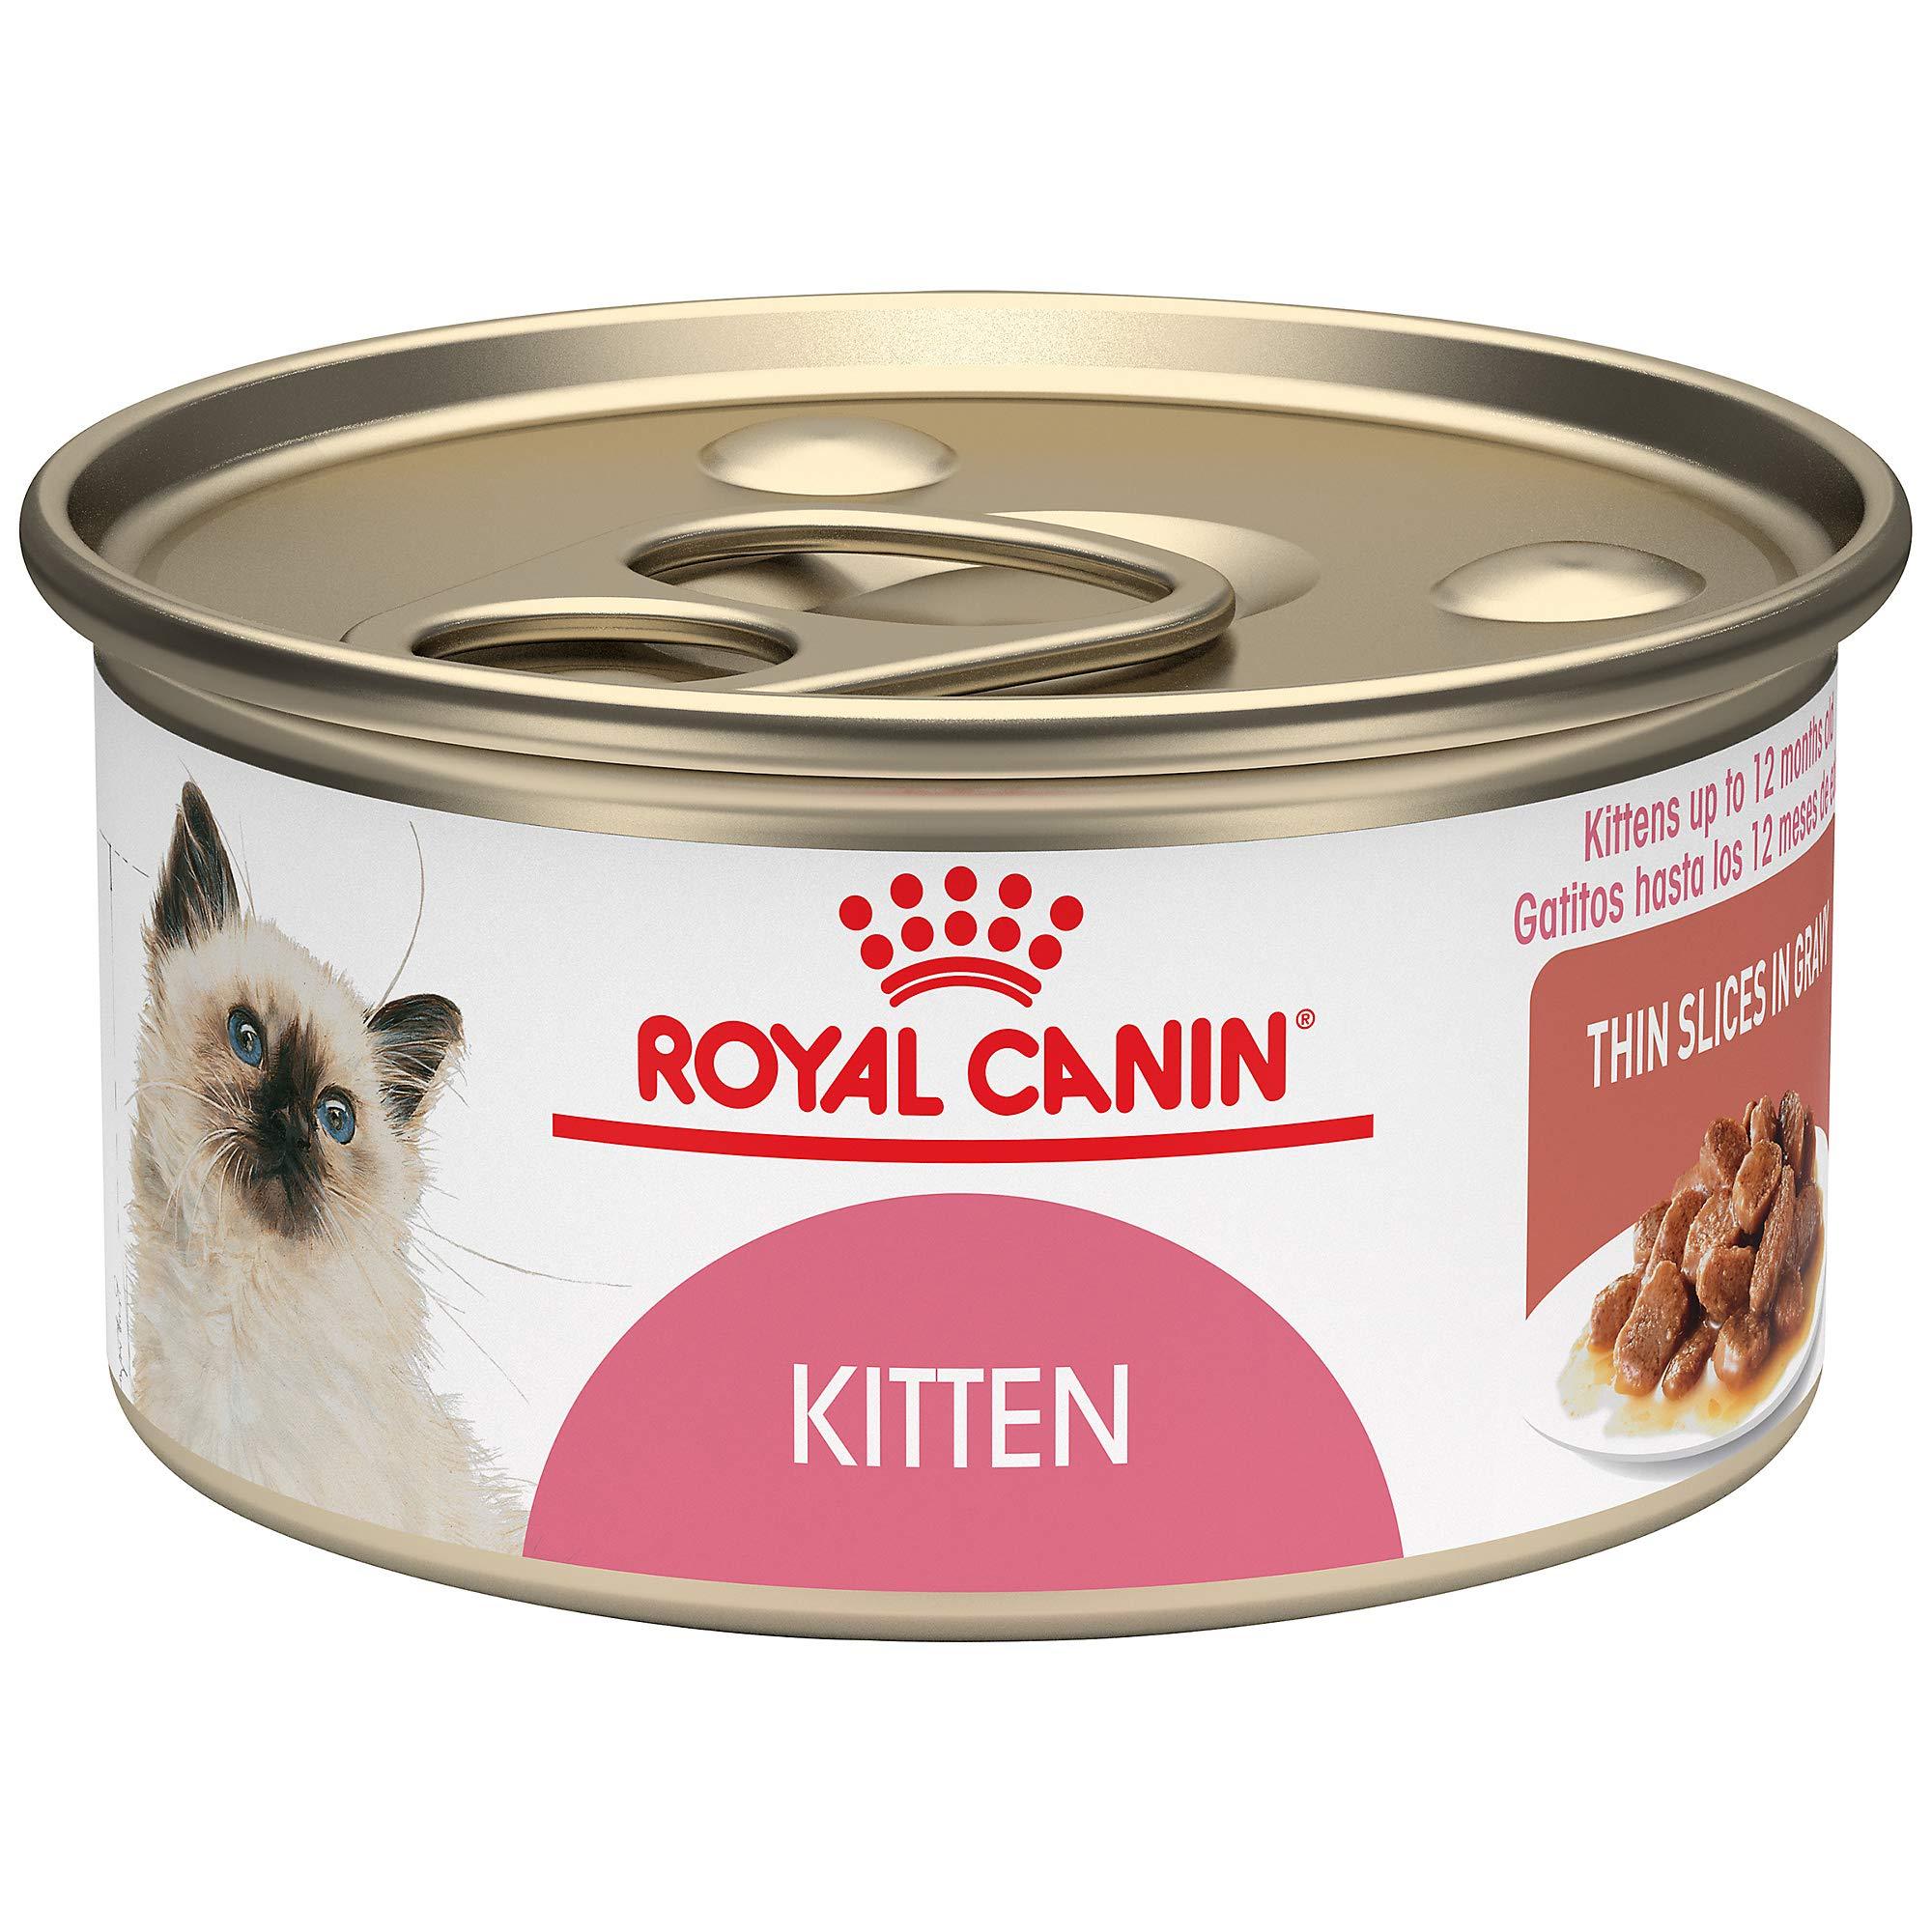 Royal Canin Feline Health Nutrition Thin Slices in Gravy Wet Kitten Food, 3 Ounce Can by Royal Canin